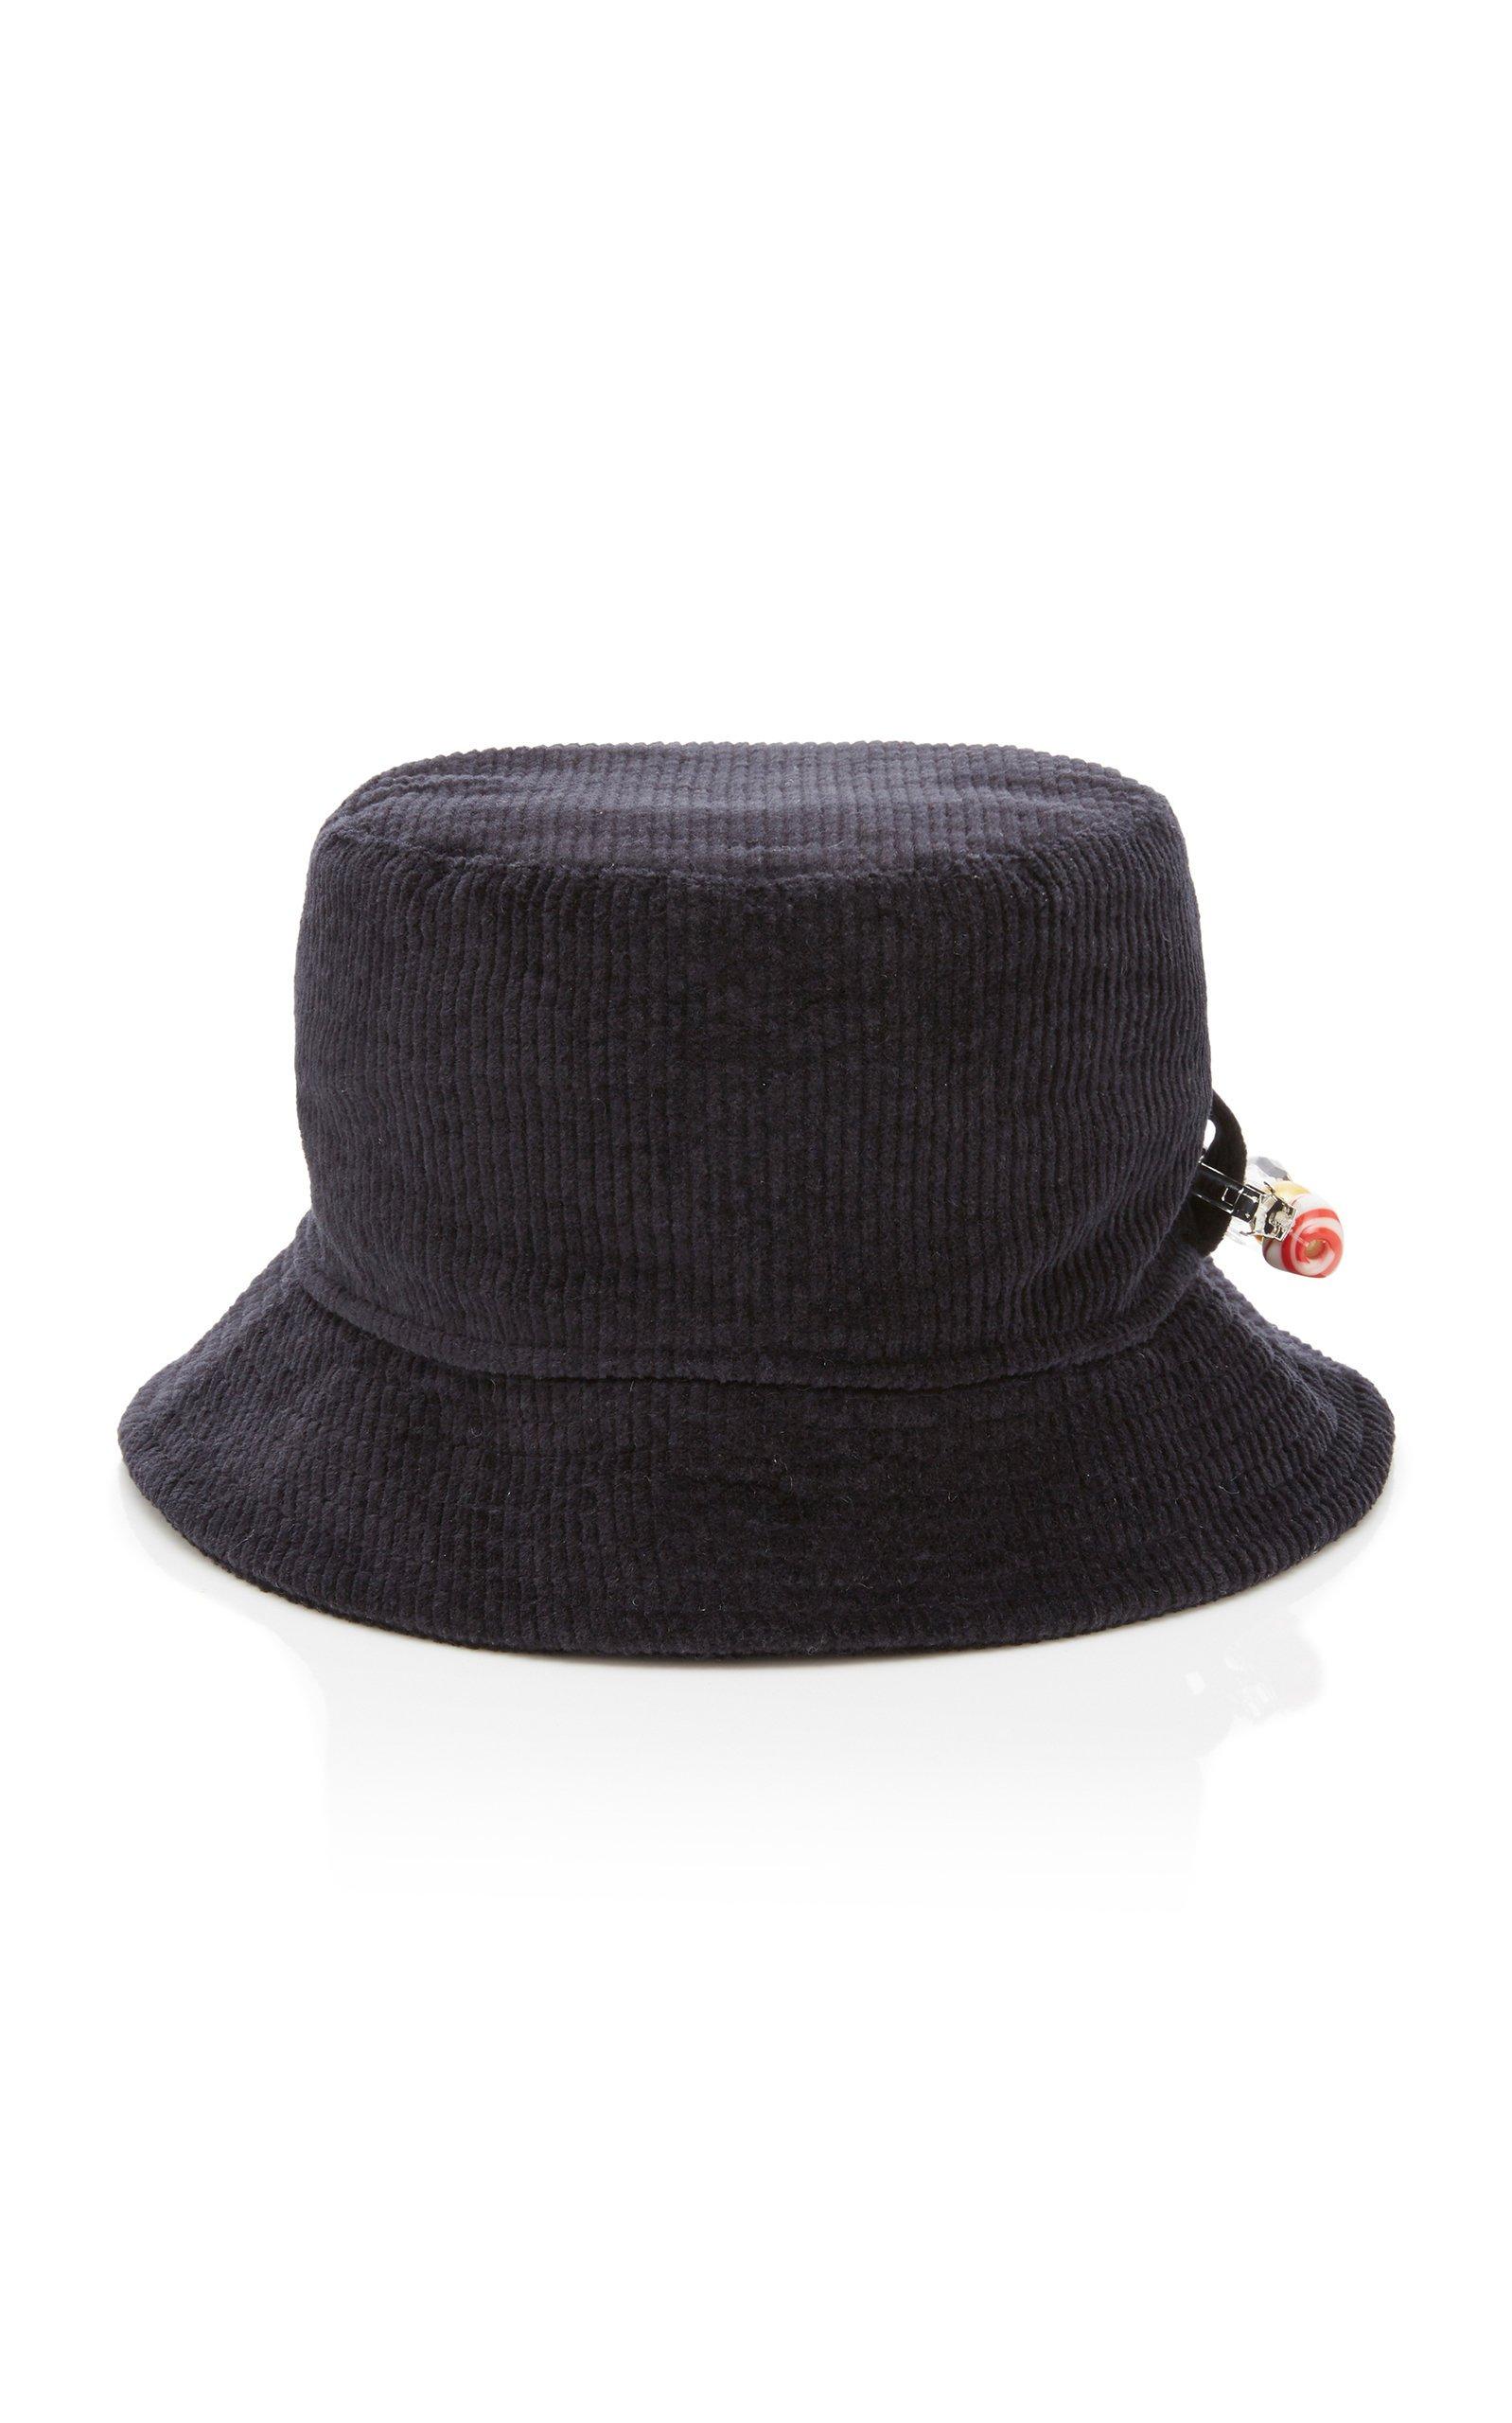 Federica Moretti Corduroy Bucket Hat Size: L